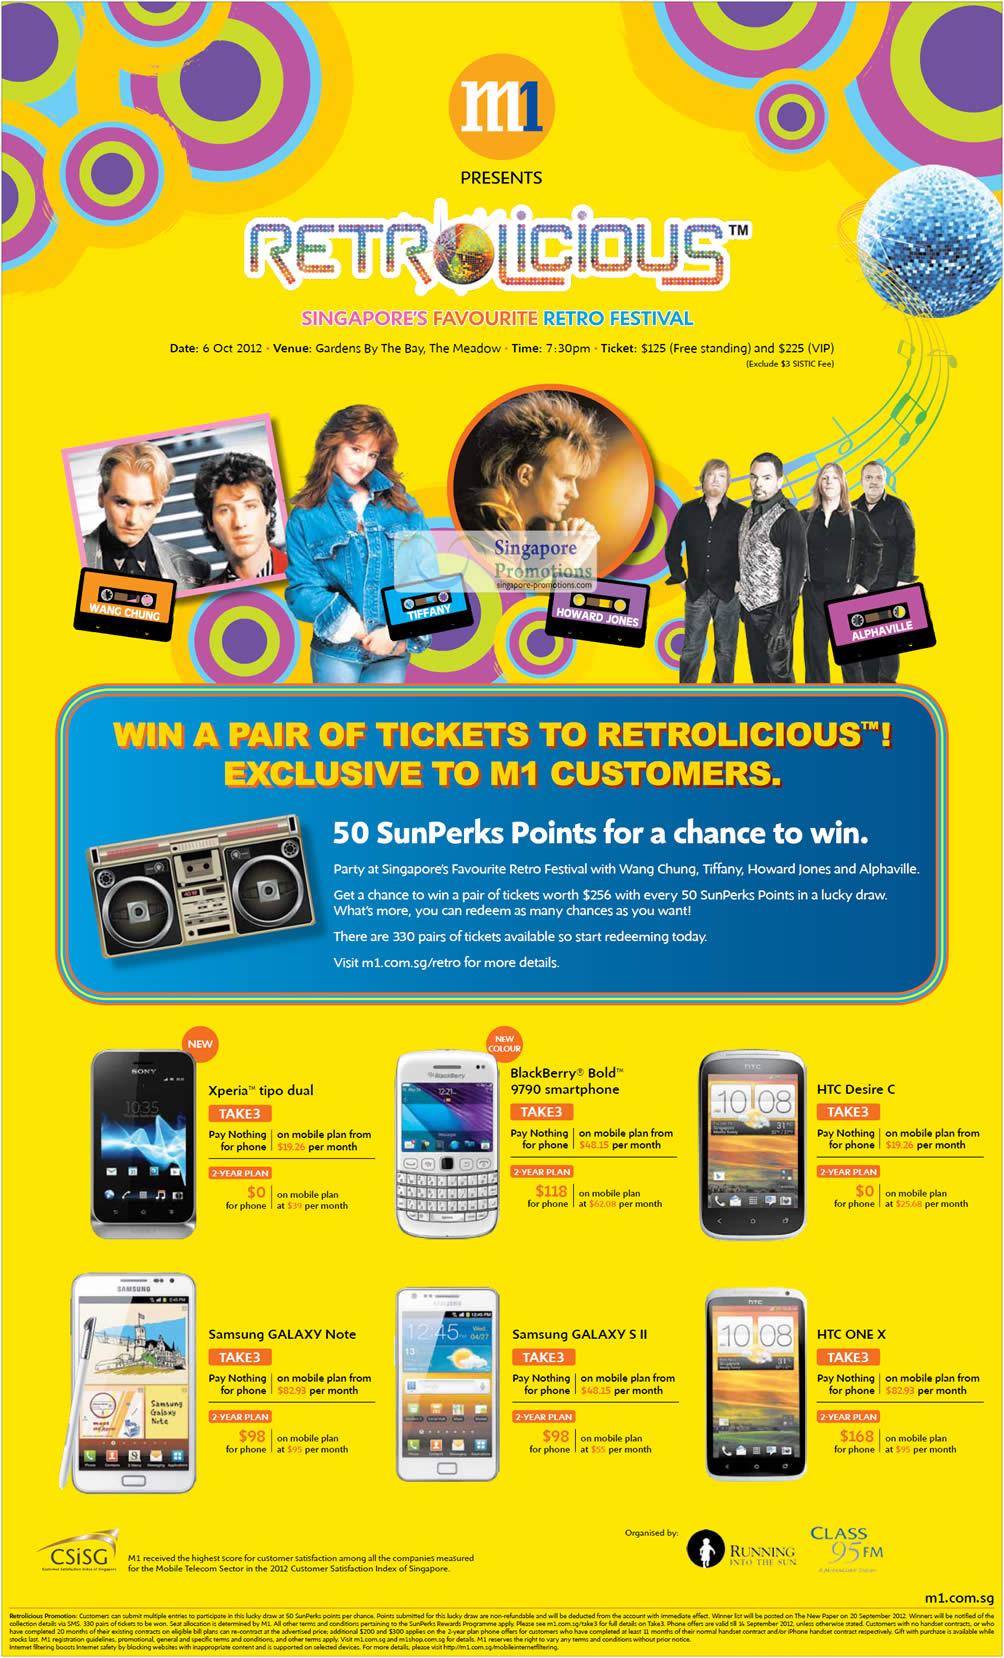 Sony Xperia Tipo Dual, Blackberry Bold 9790, HTC Desire C, One X, Samsung Galaxy Note, Samsung Galaxy S II